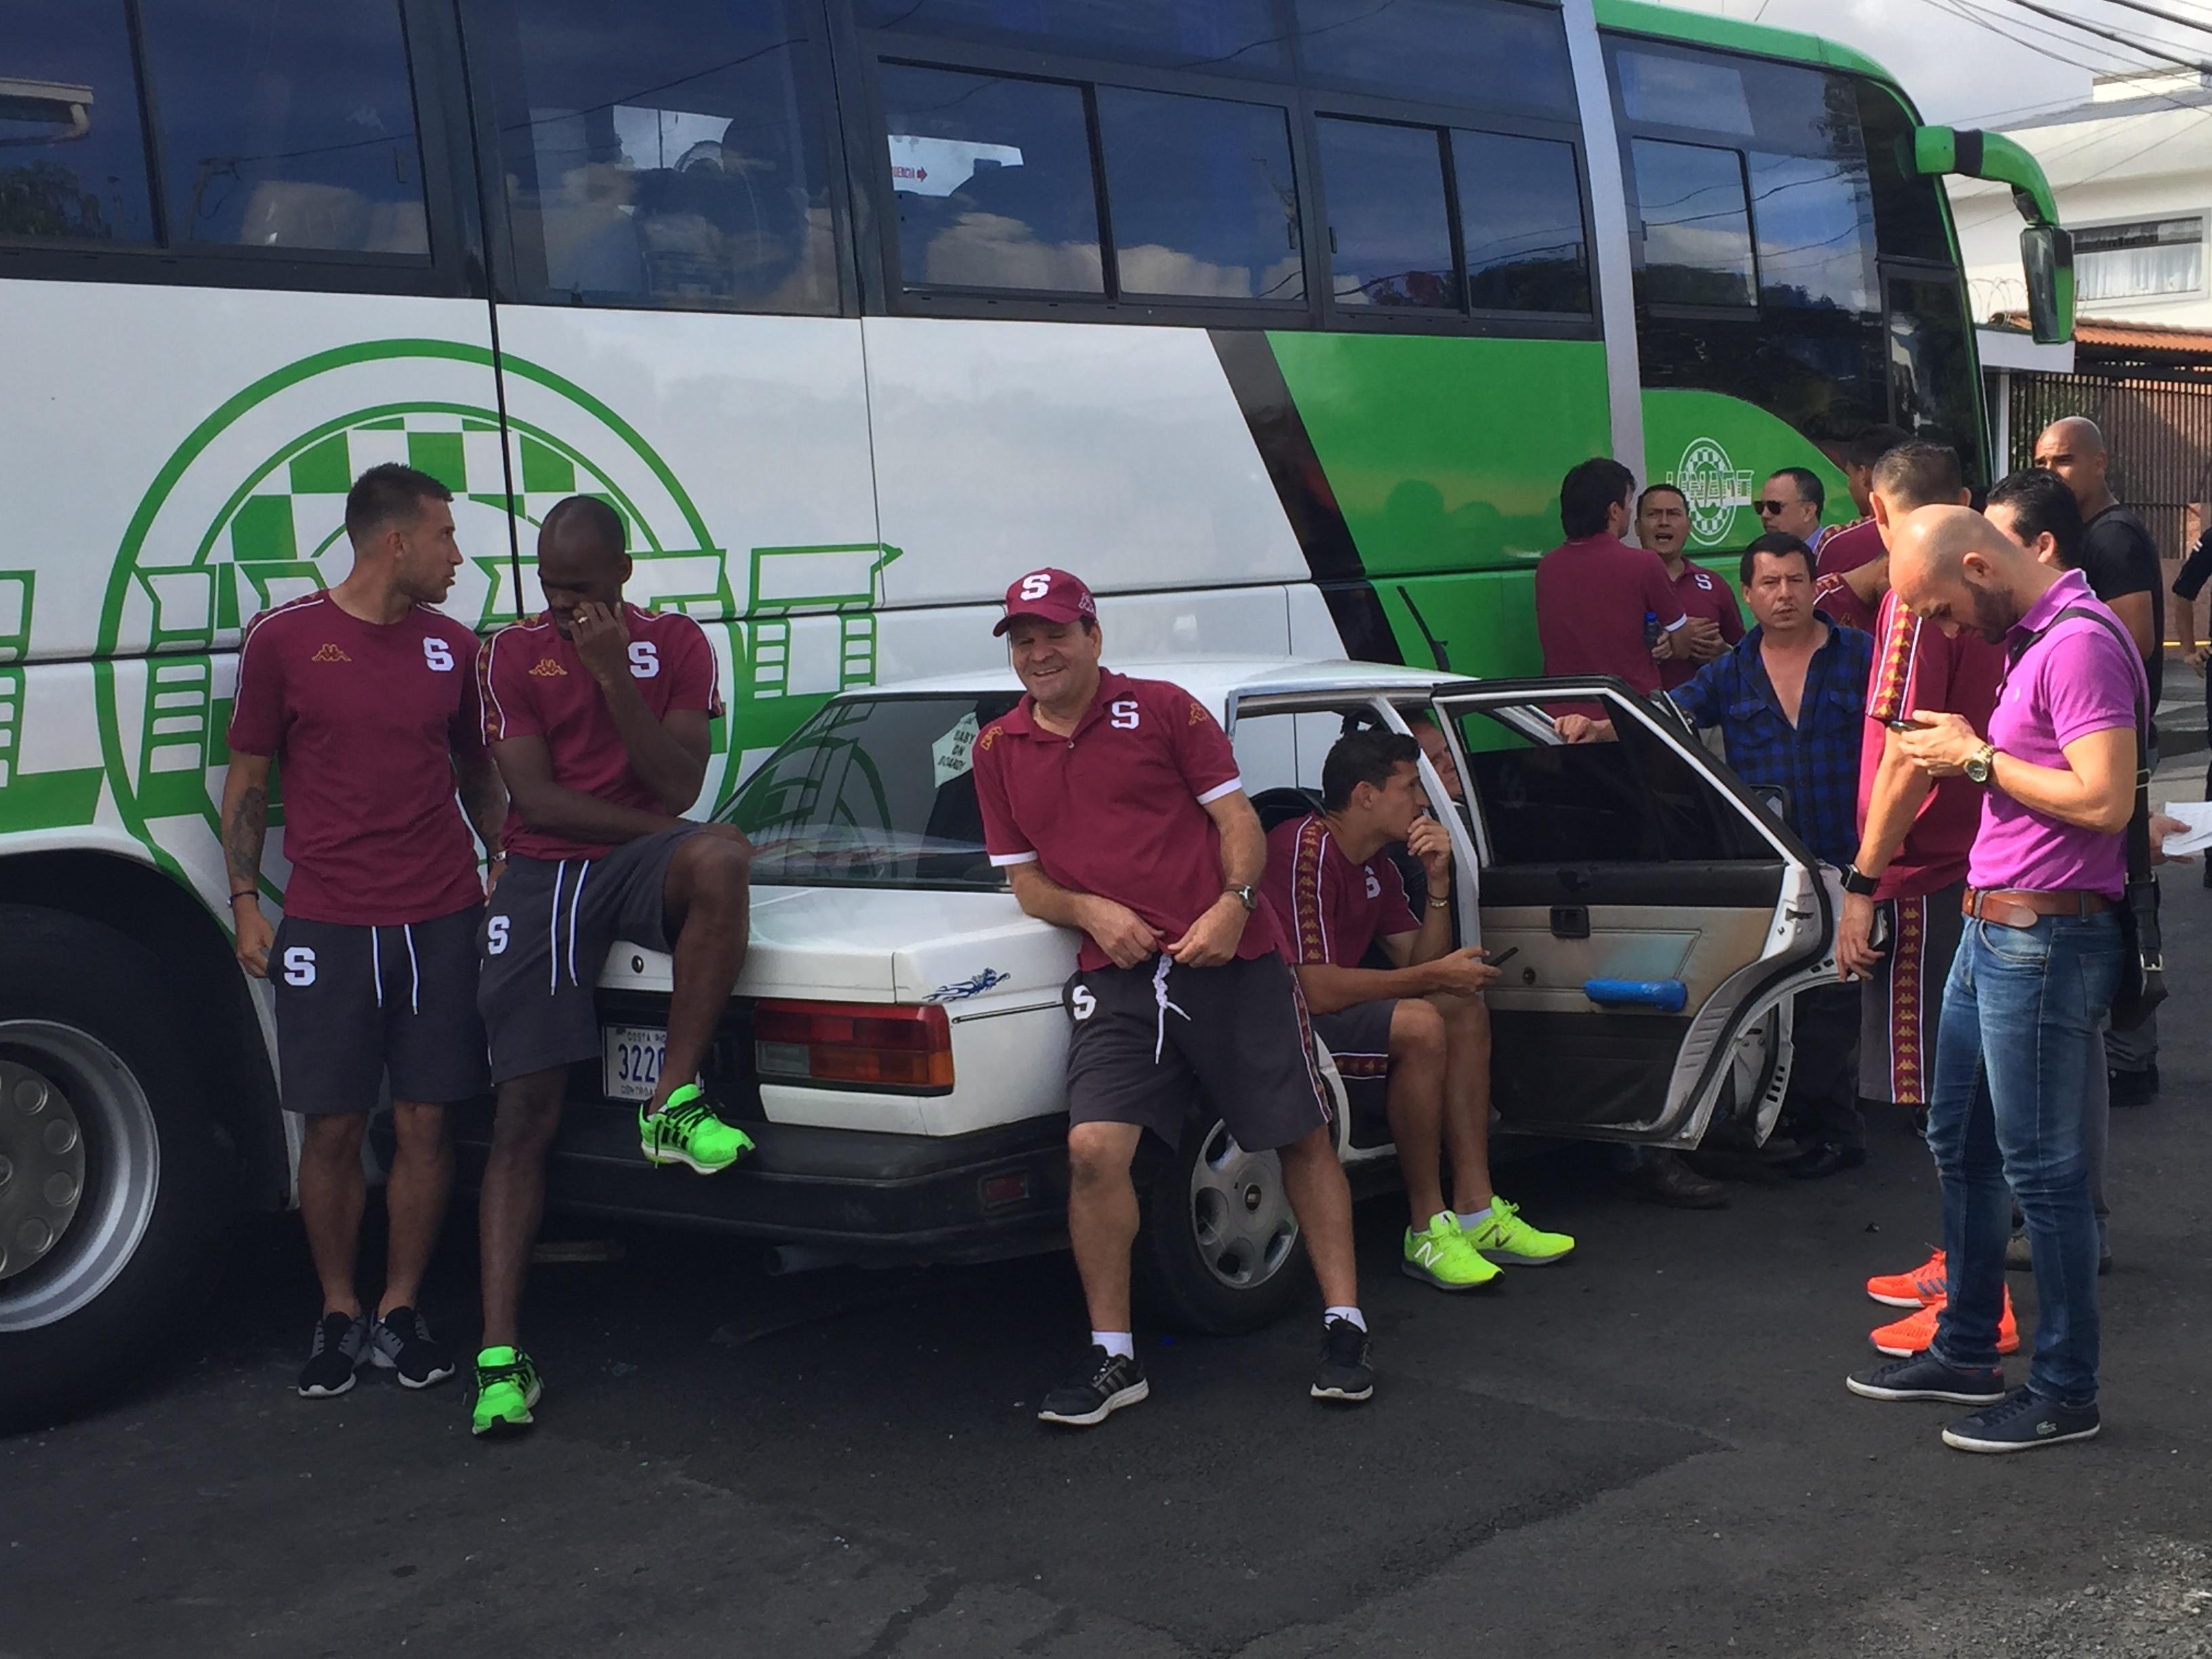 Saprissa-Bus Accident costa rica soccer